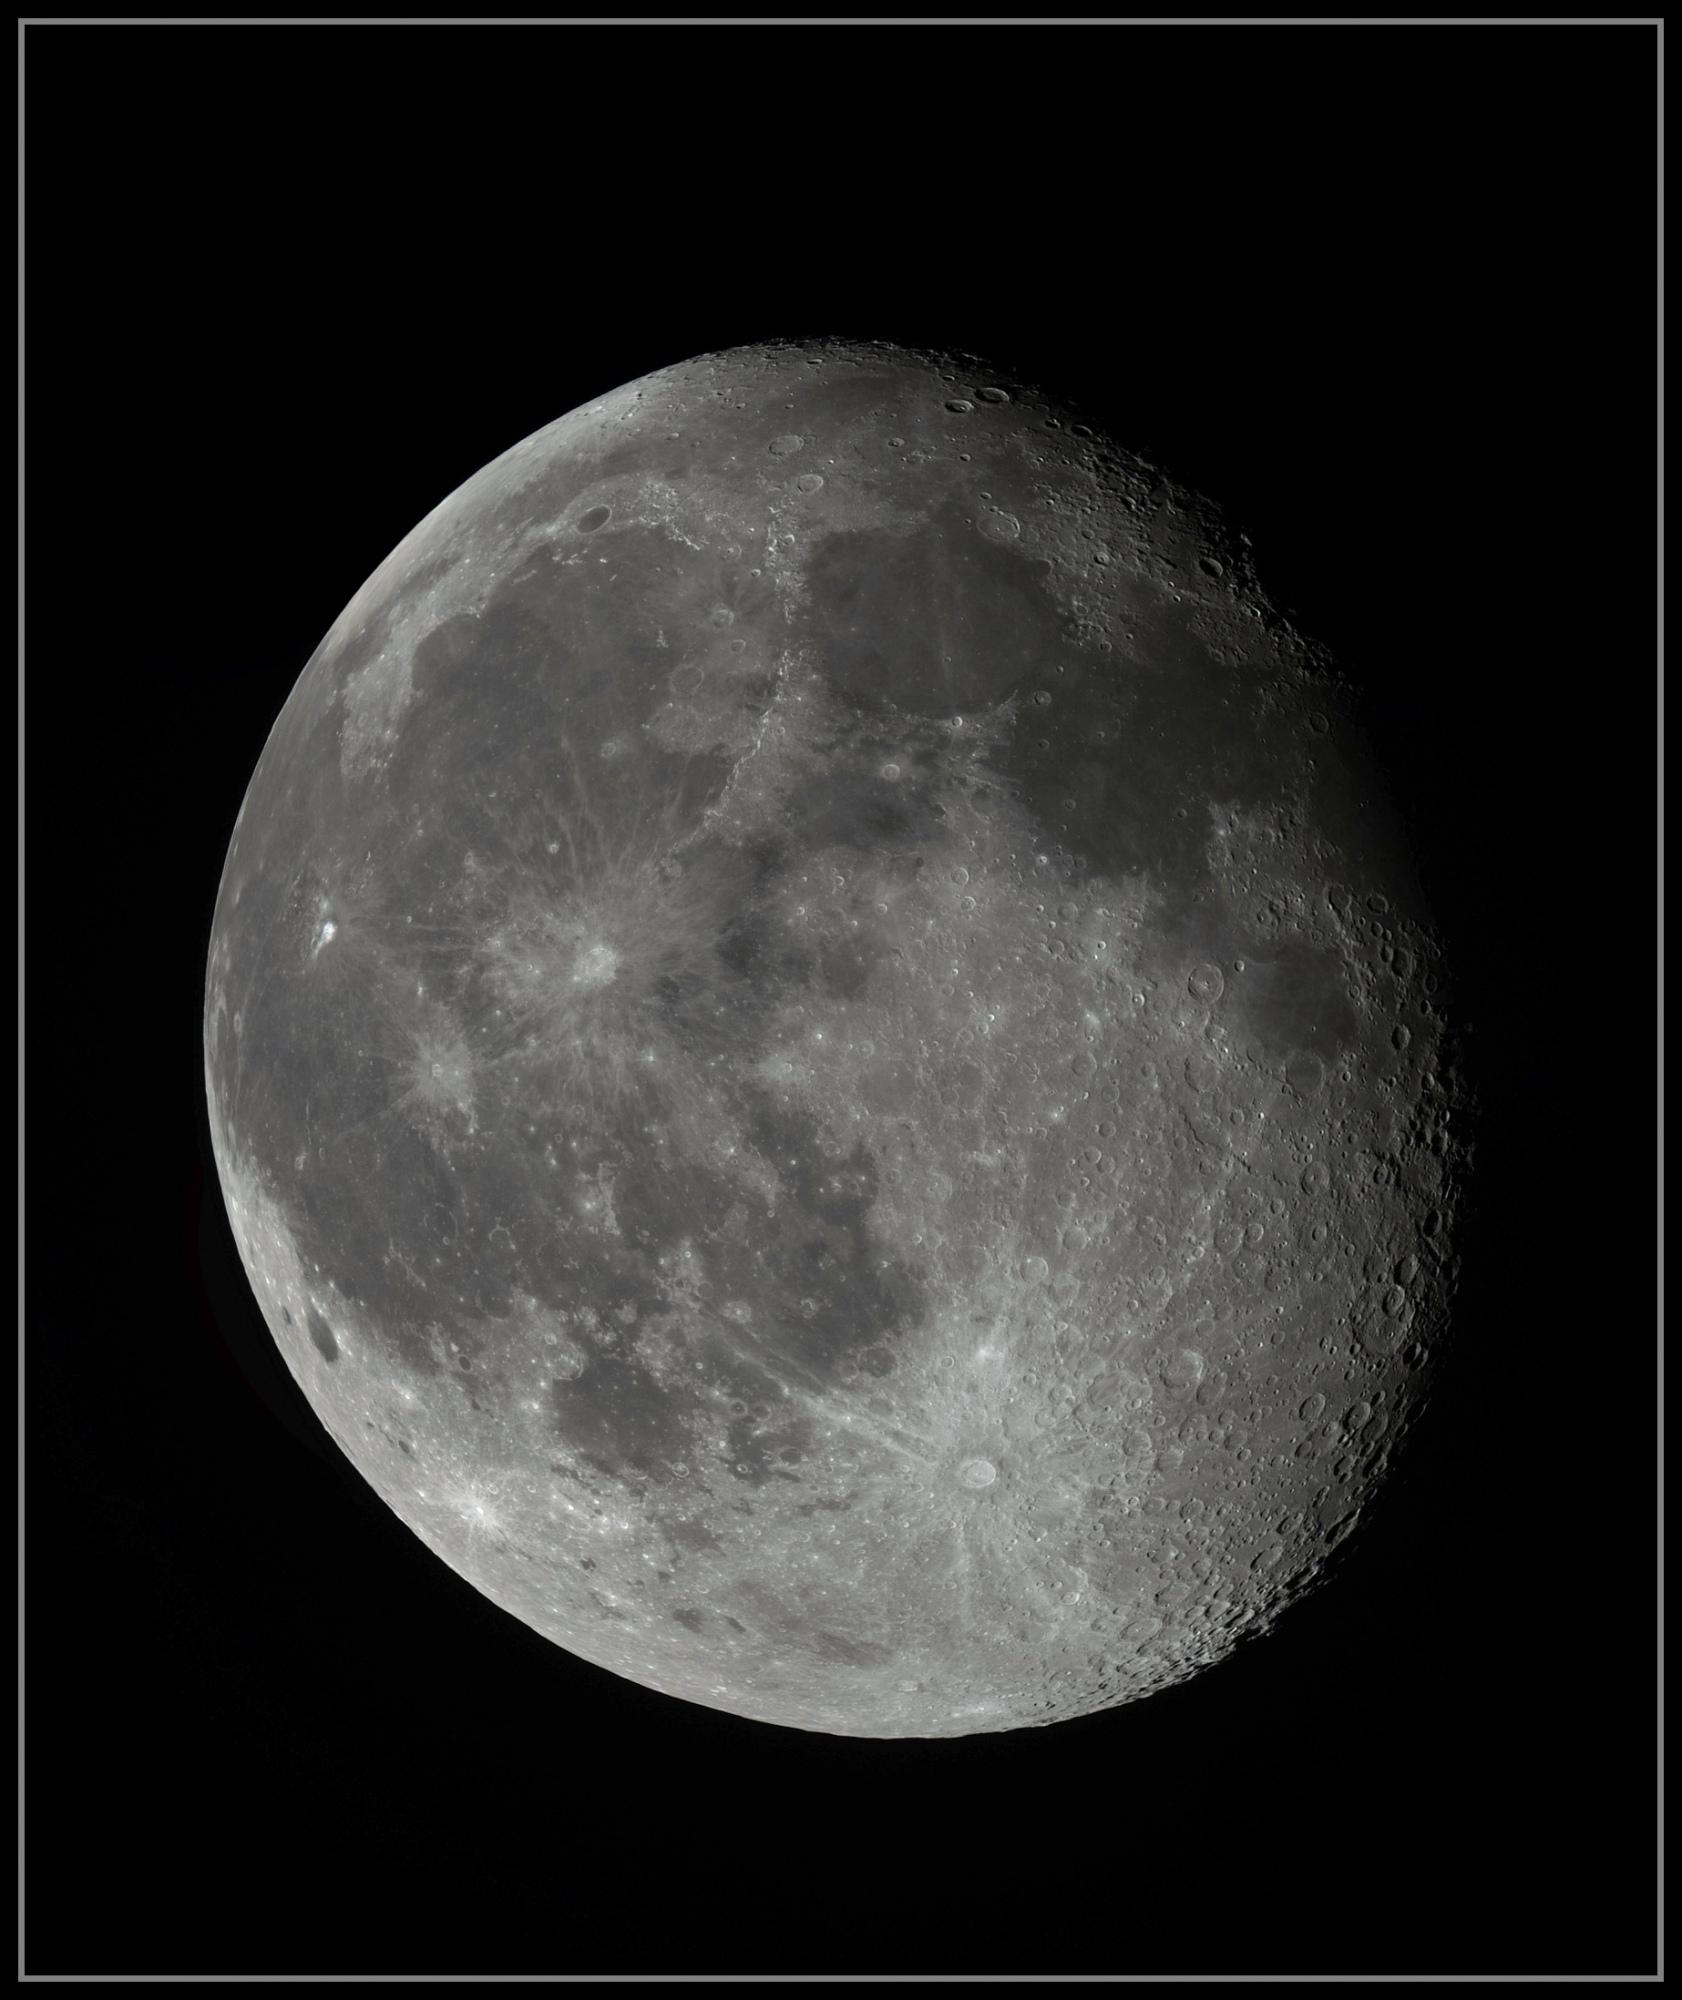 5e56c80e96a14_Moon_053643_120220_ZWOASI224MC_RGB_AS_P20_lapl4_ap648_stitch-1finale.thumb.jpg.191f2ddd15ad1da8fde6ba9f23ff7eea.jpg